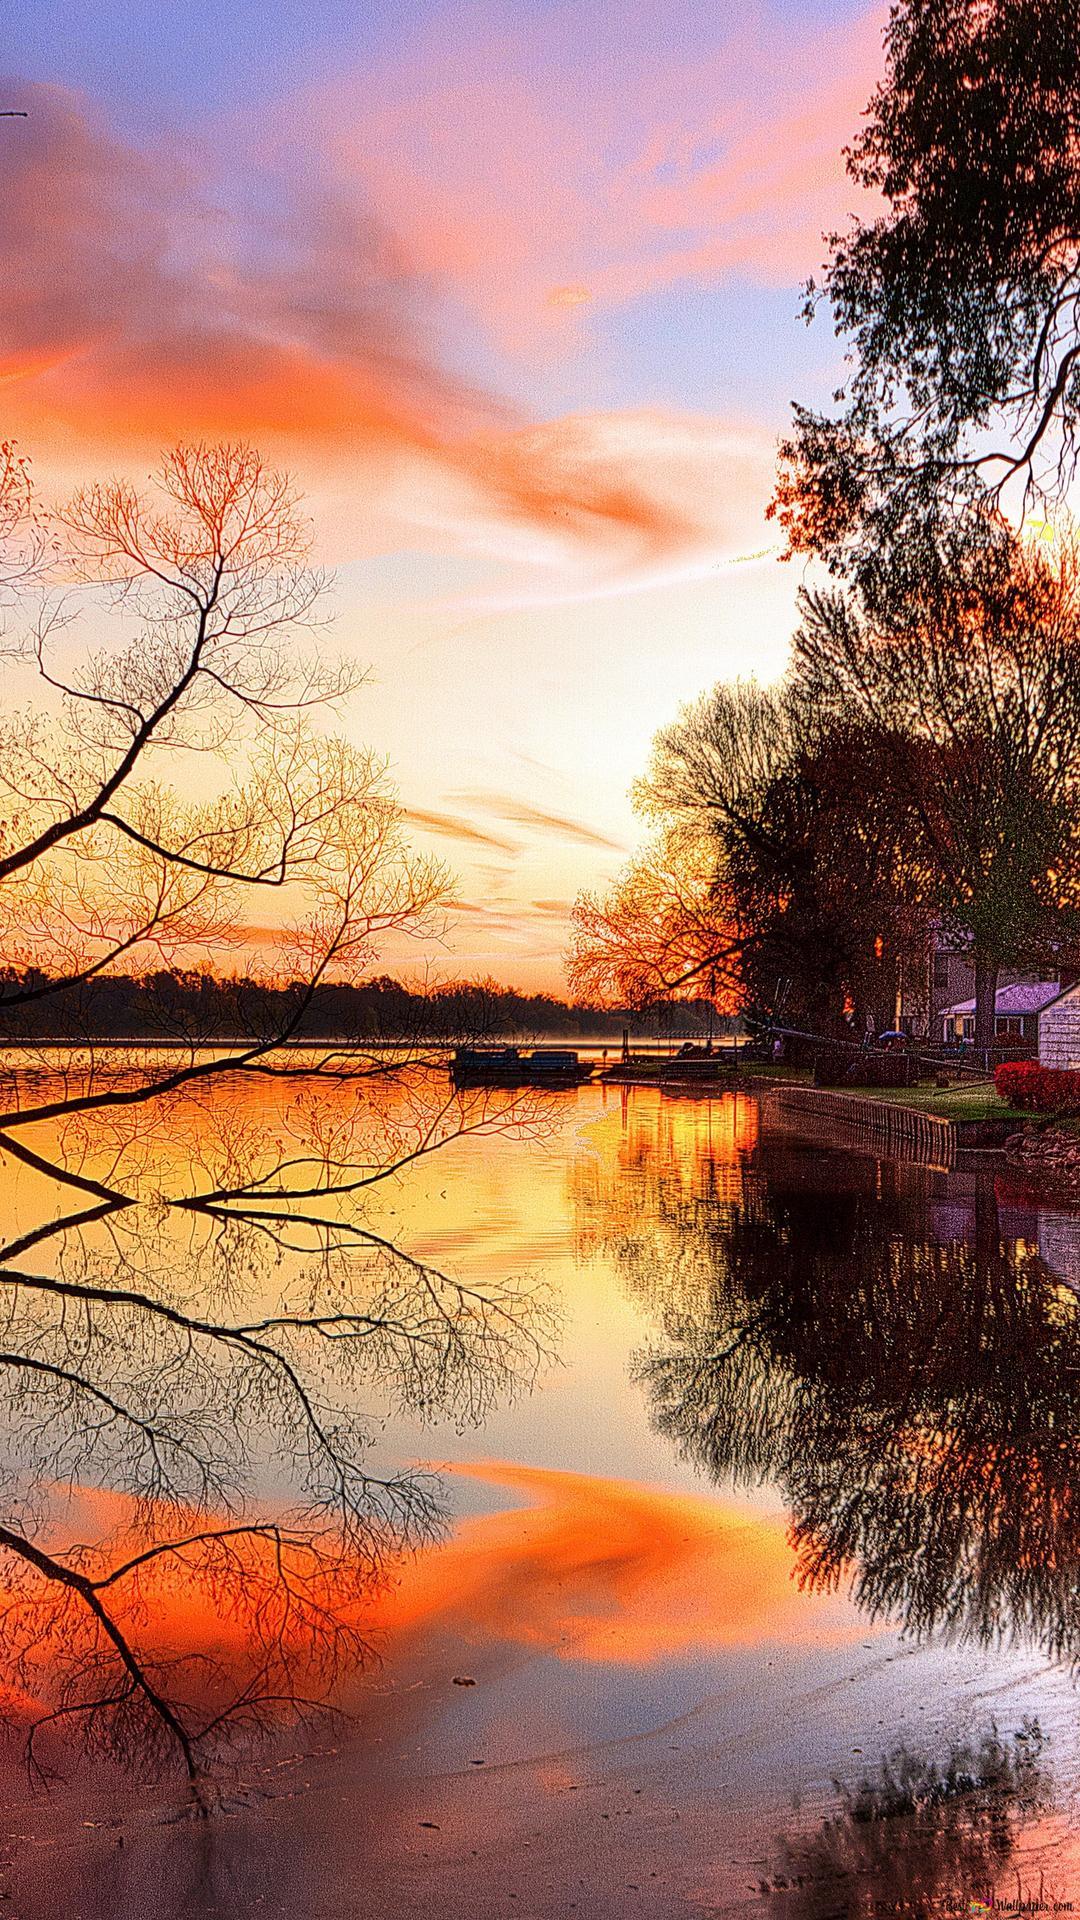 Evening Lake View Hd Wallpaper Download